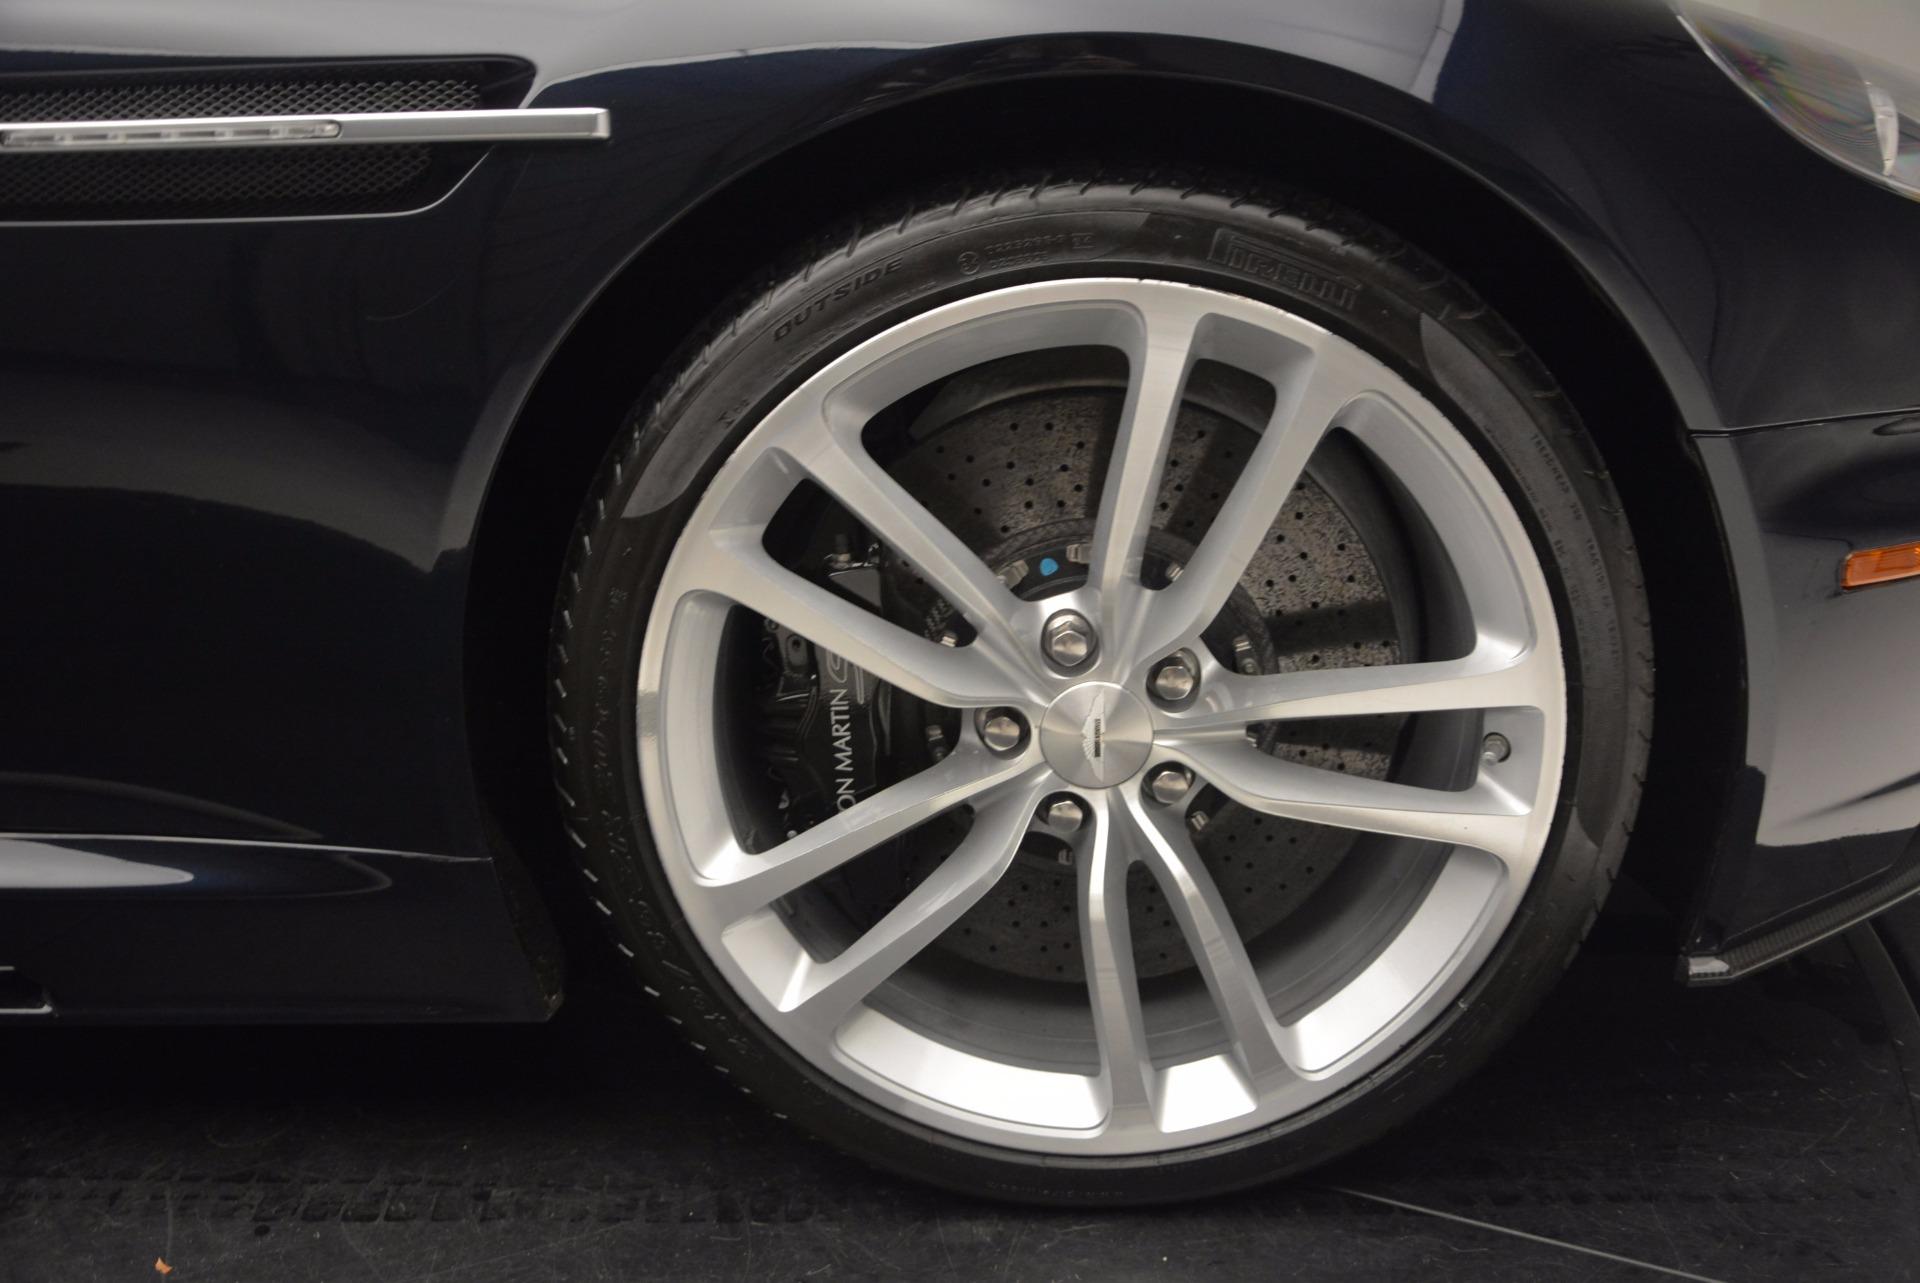 Used 2012 Aston Martin DBS Volante For Sale In Greenwich, CT 644_p36